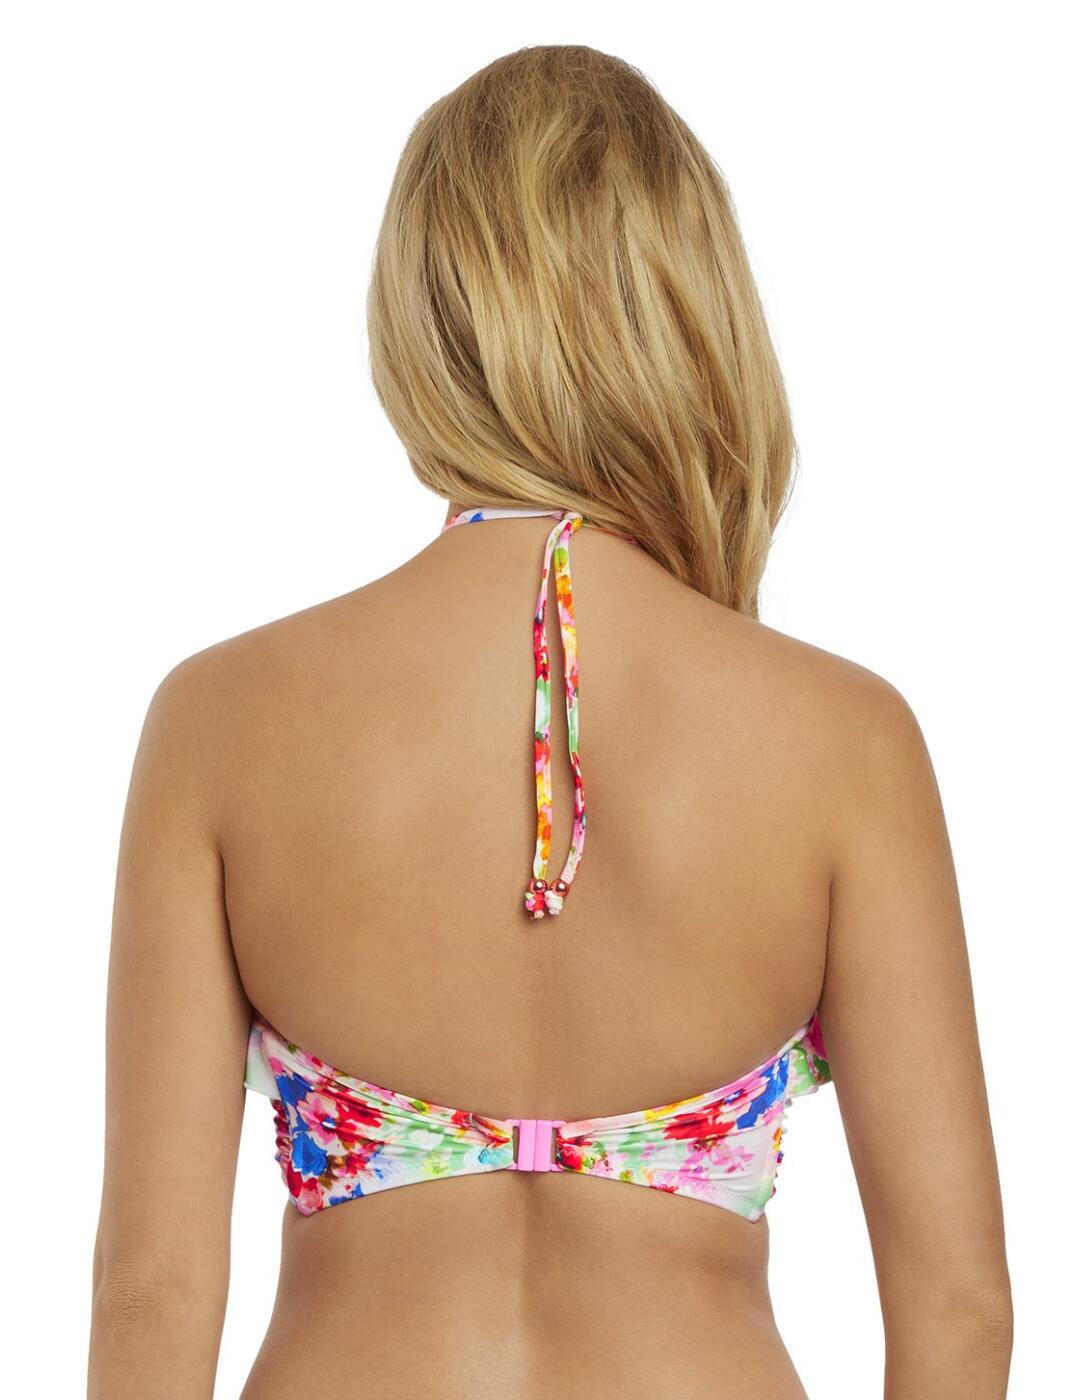 Freya Endless Summer Bikini Top Underwired Padded Strapless 2964 New Swimwear